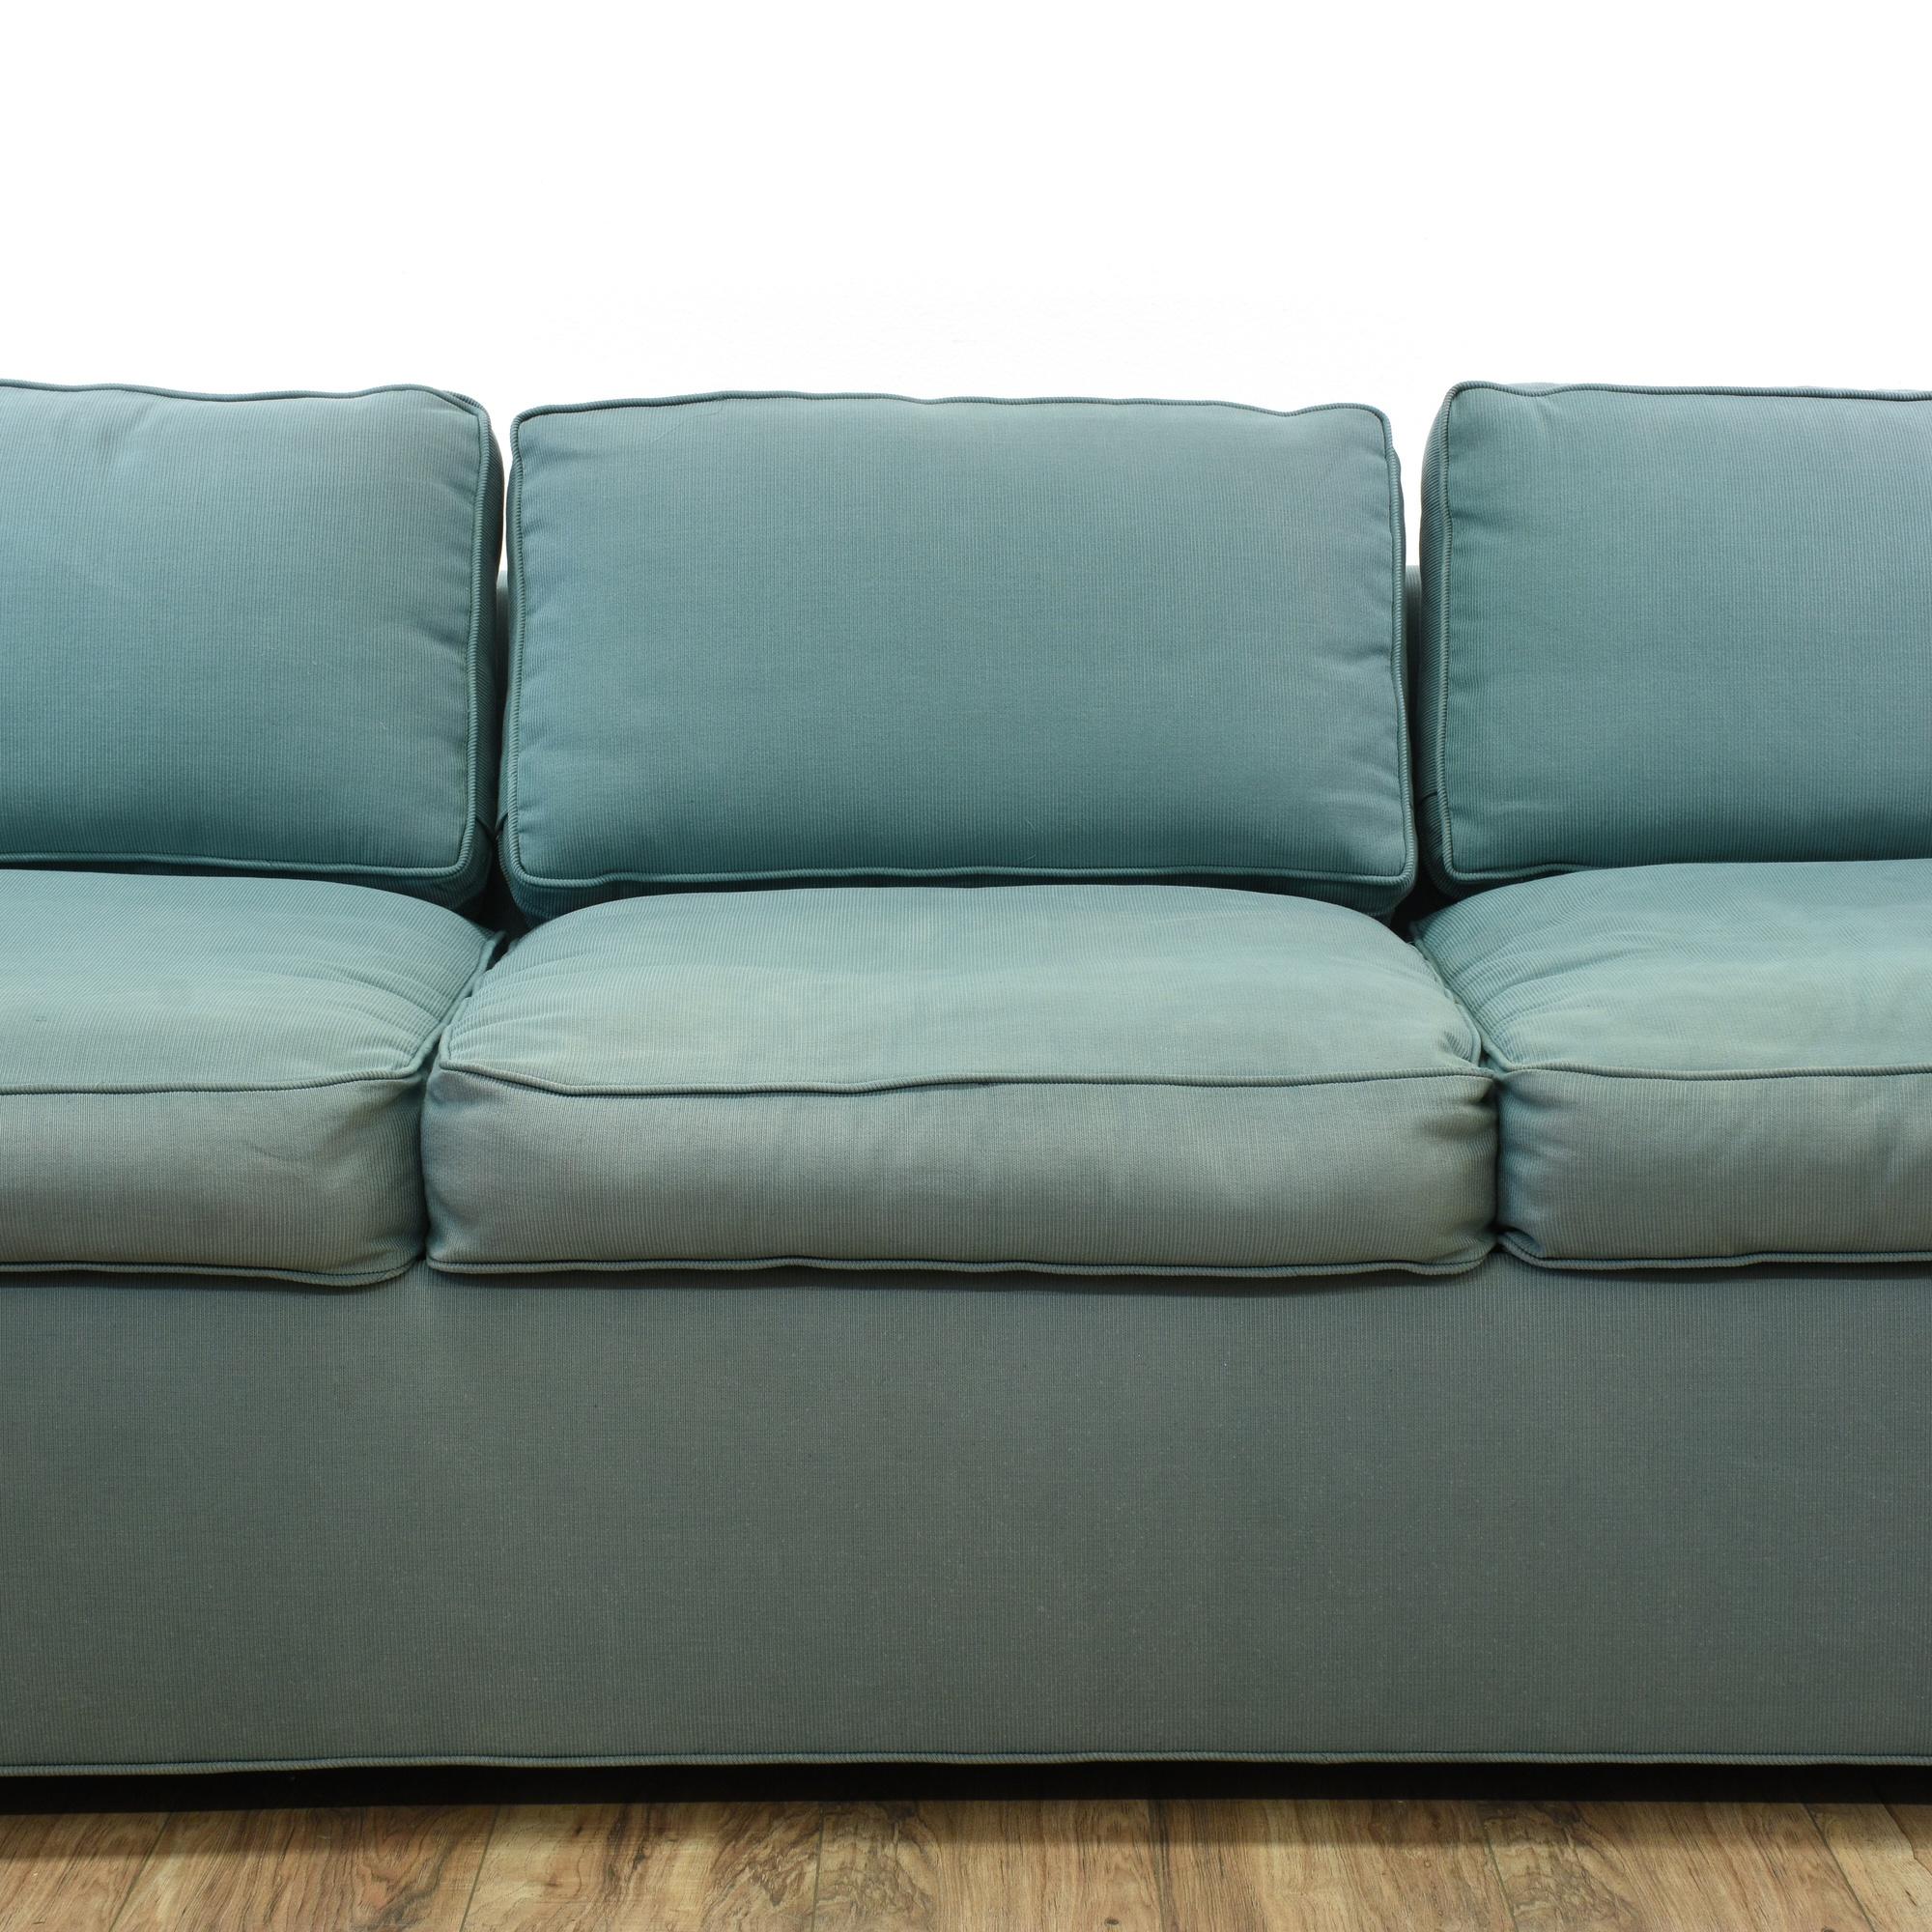 Sleeper Sofa San Francisco: Contemporary Blue Sleeper Sofa Bed